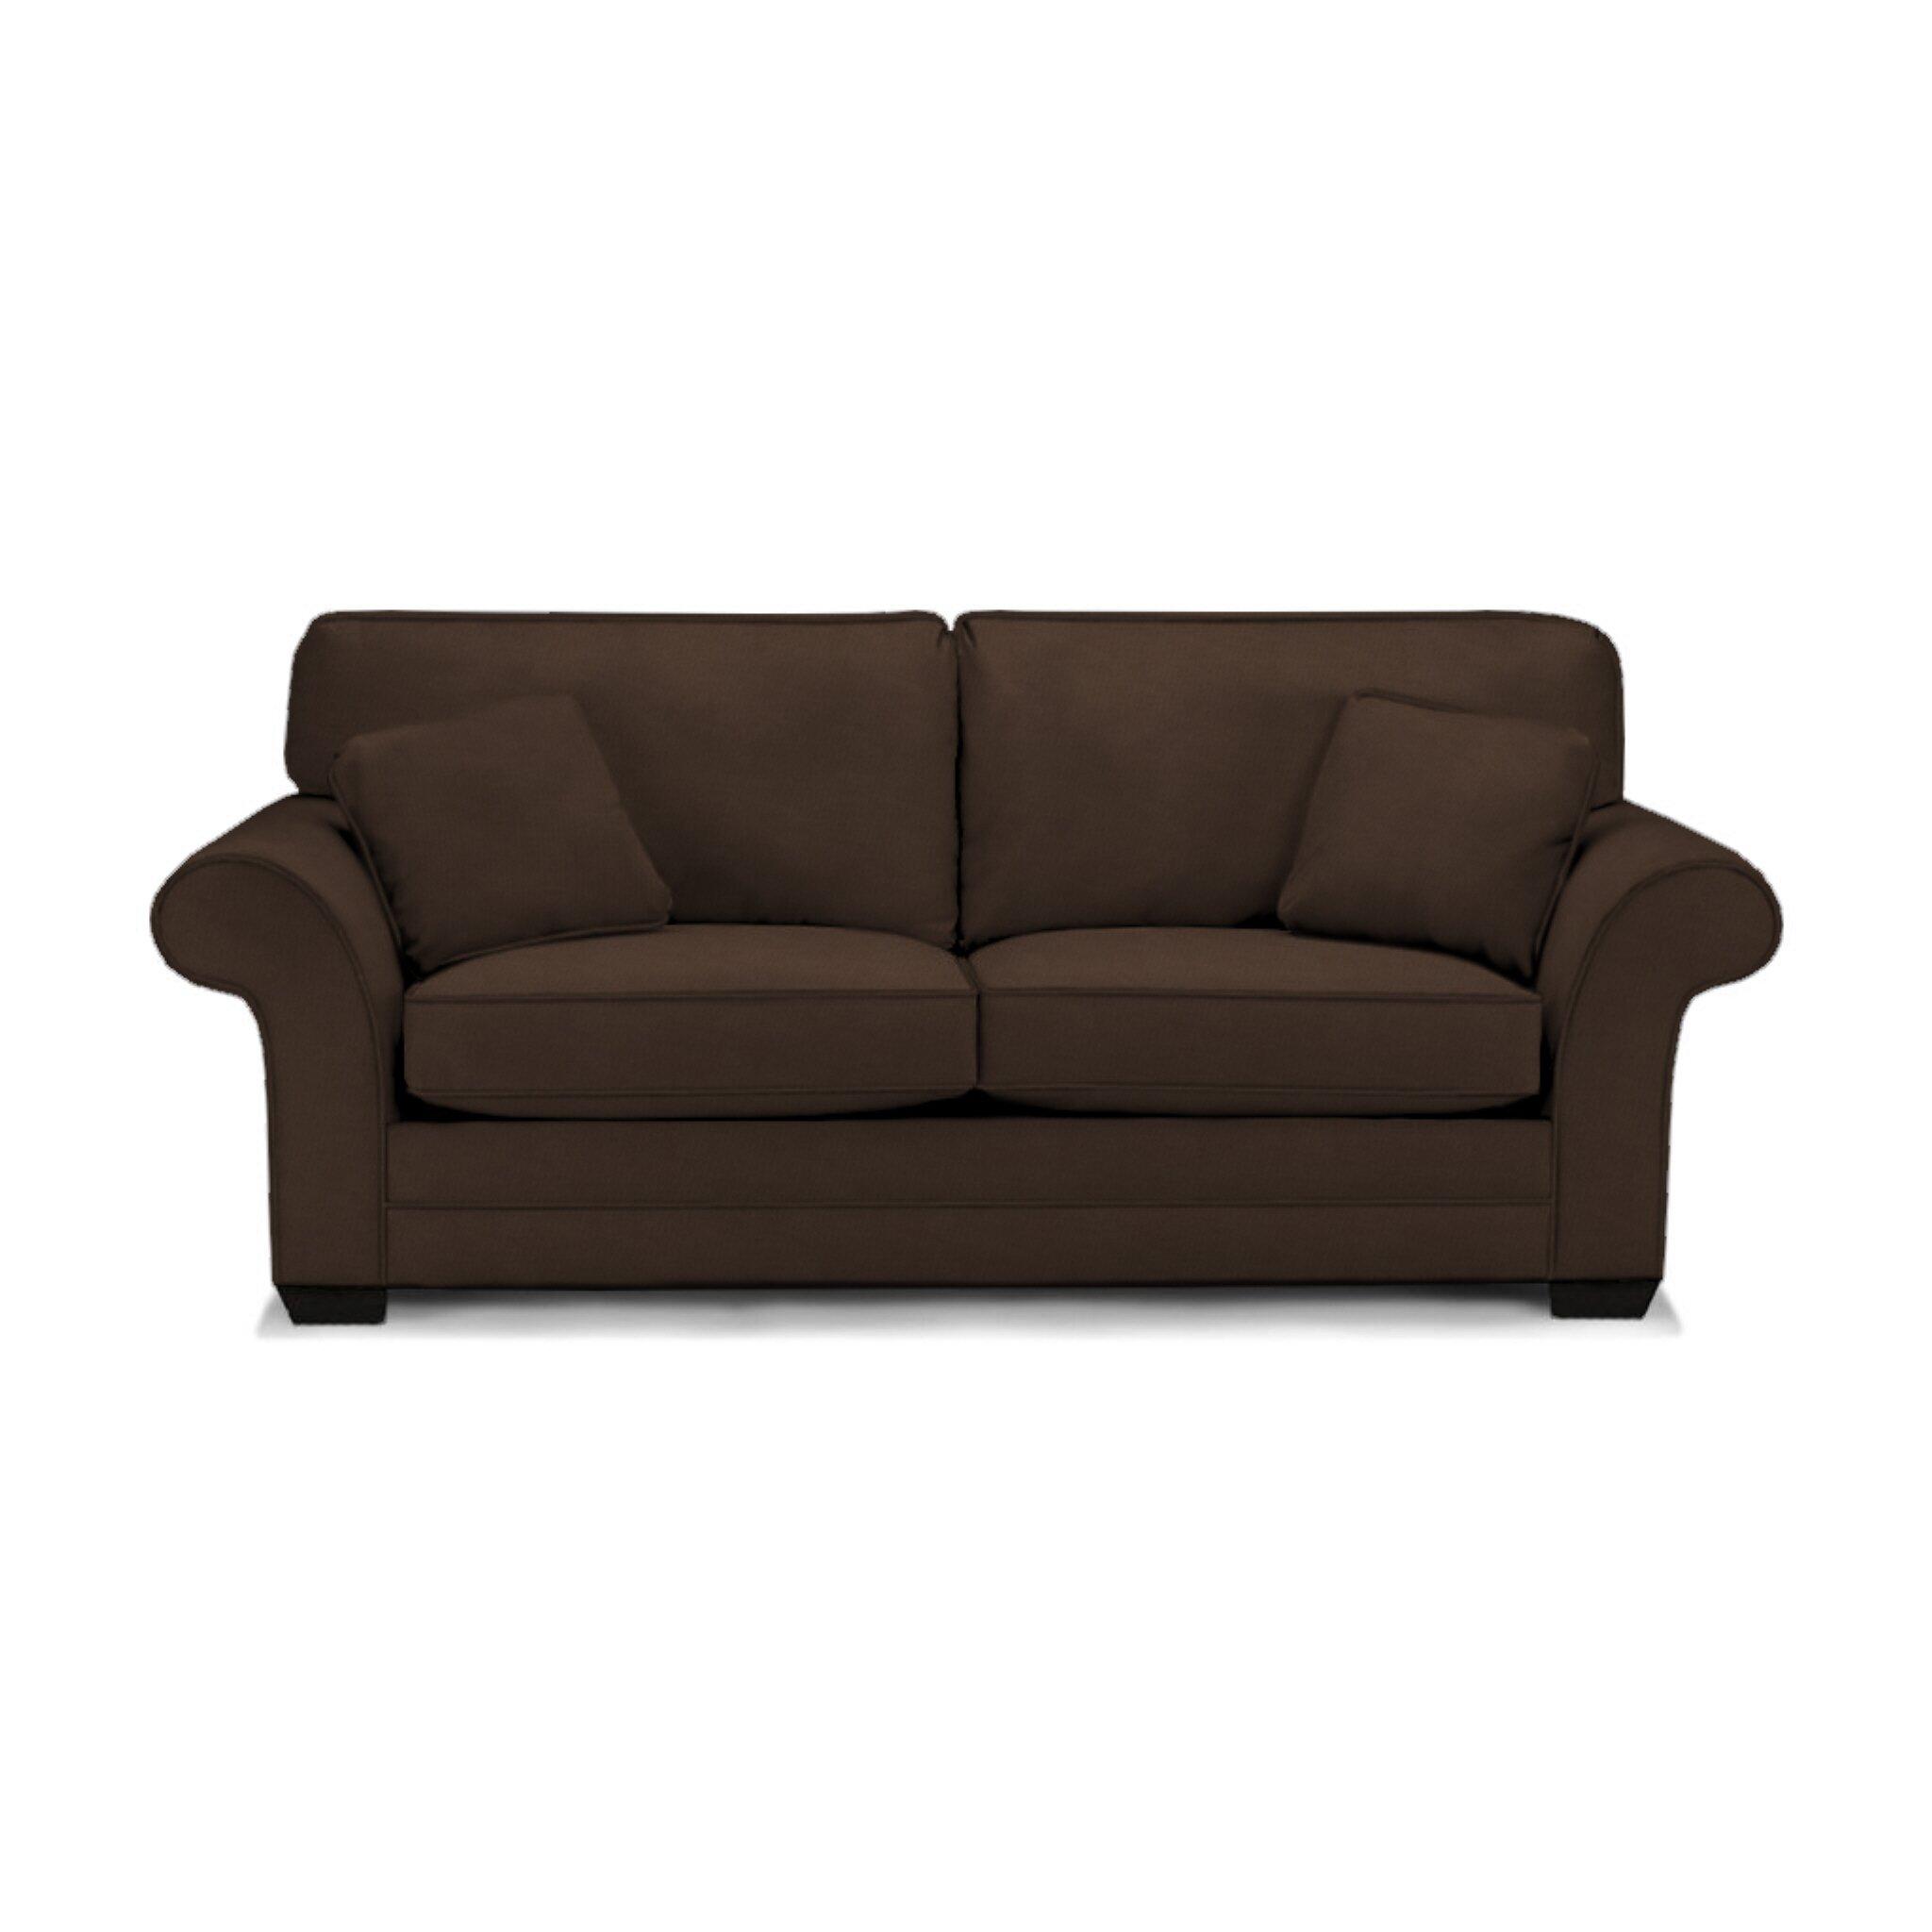 Klaussner Furniture Bart Sofa & Reviews | Wayfair Supply